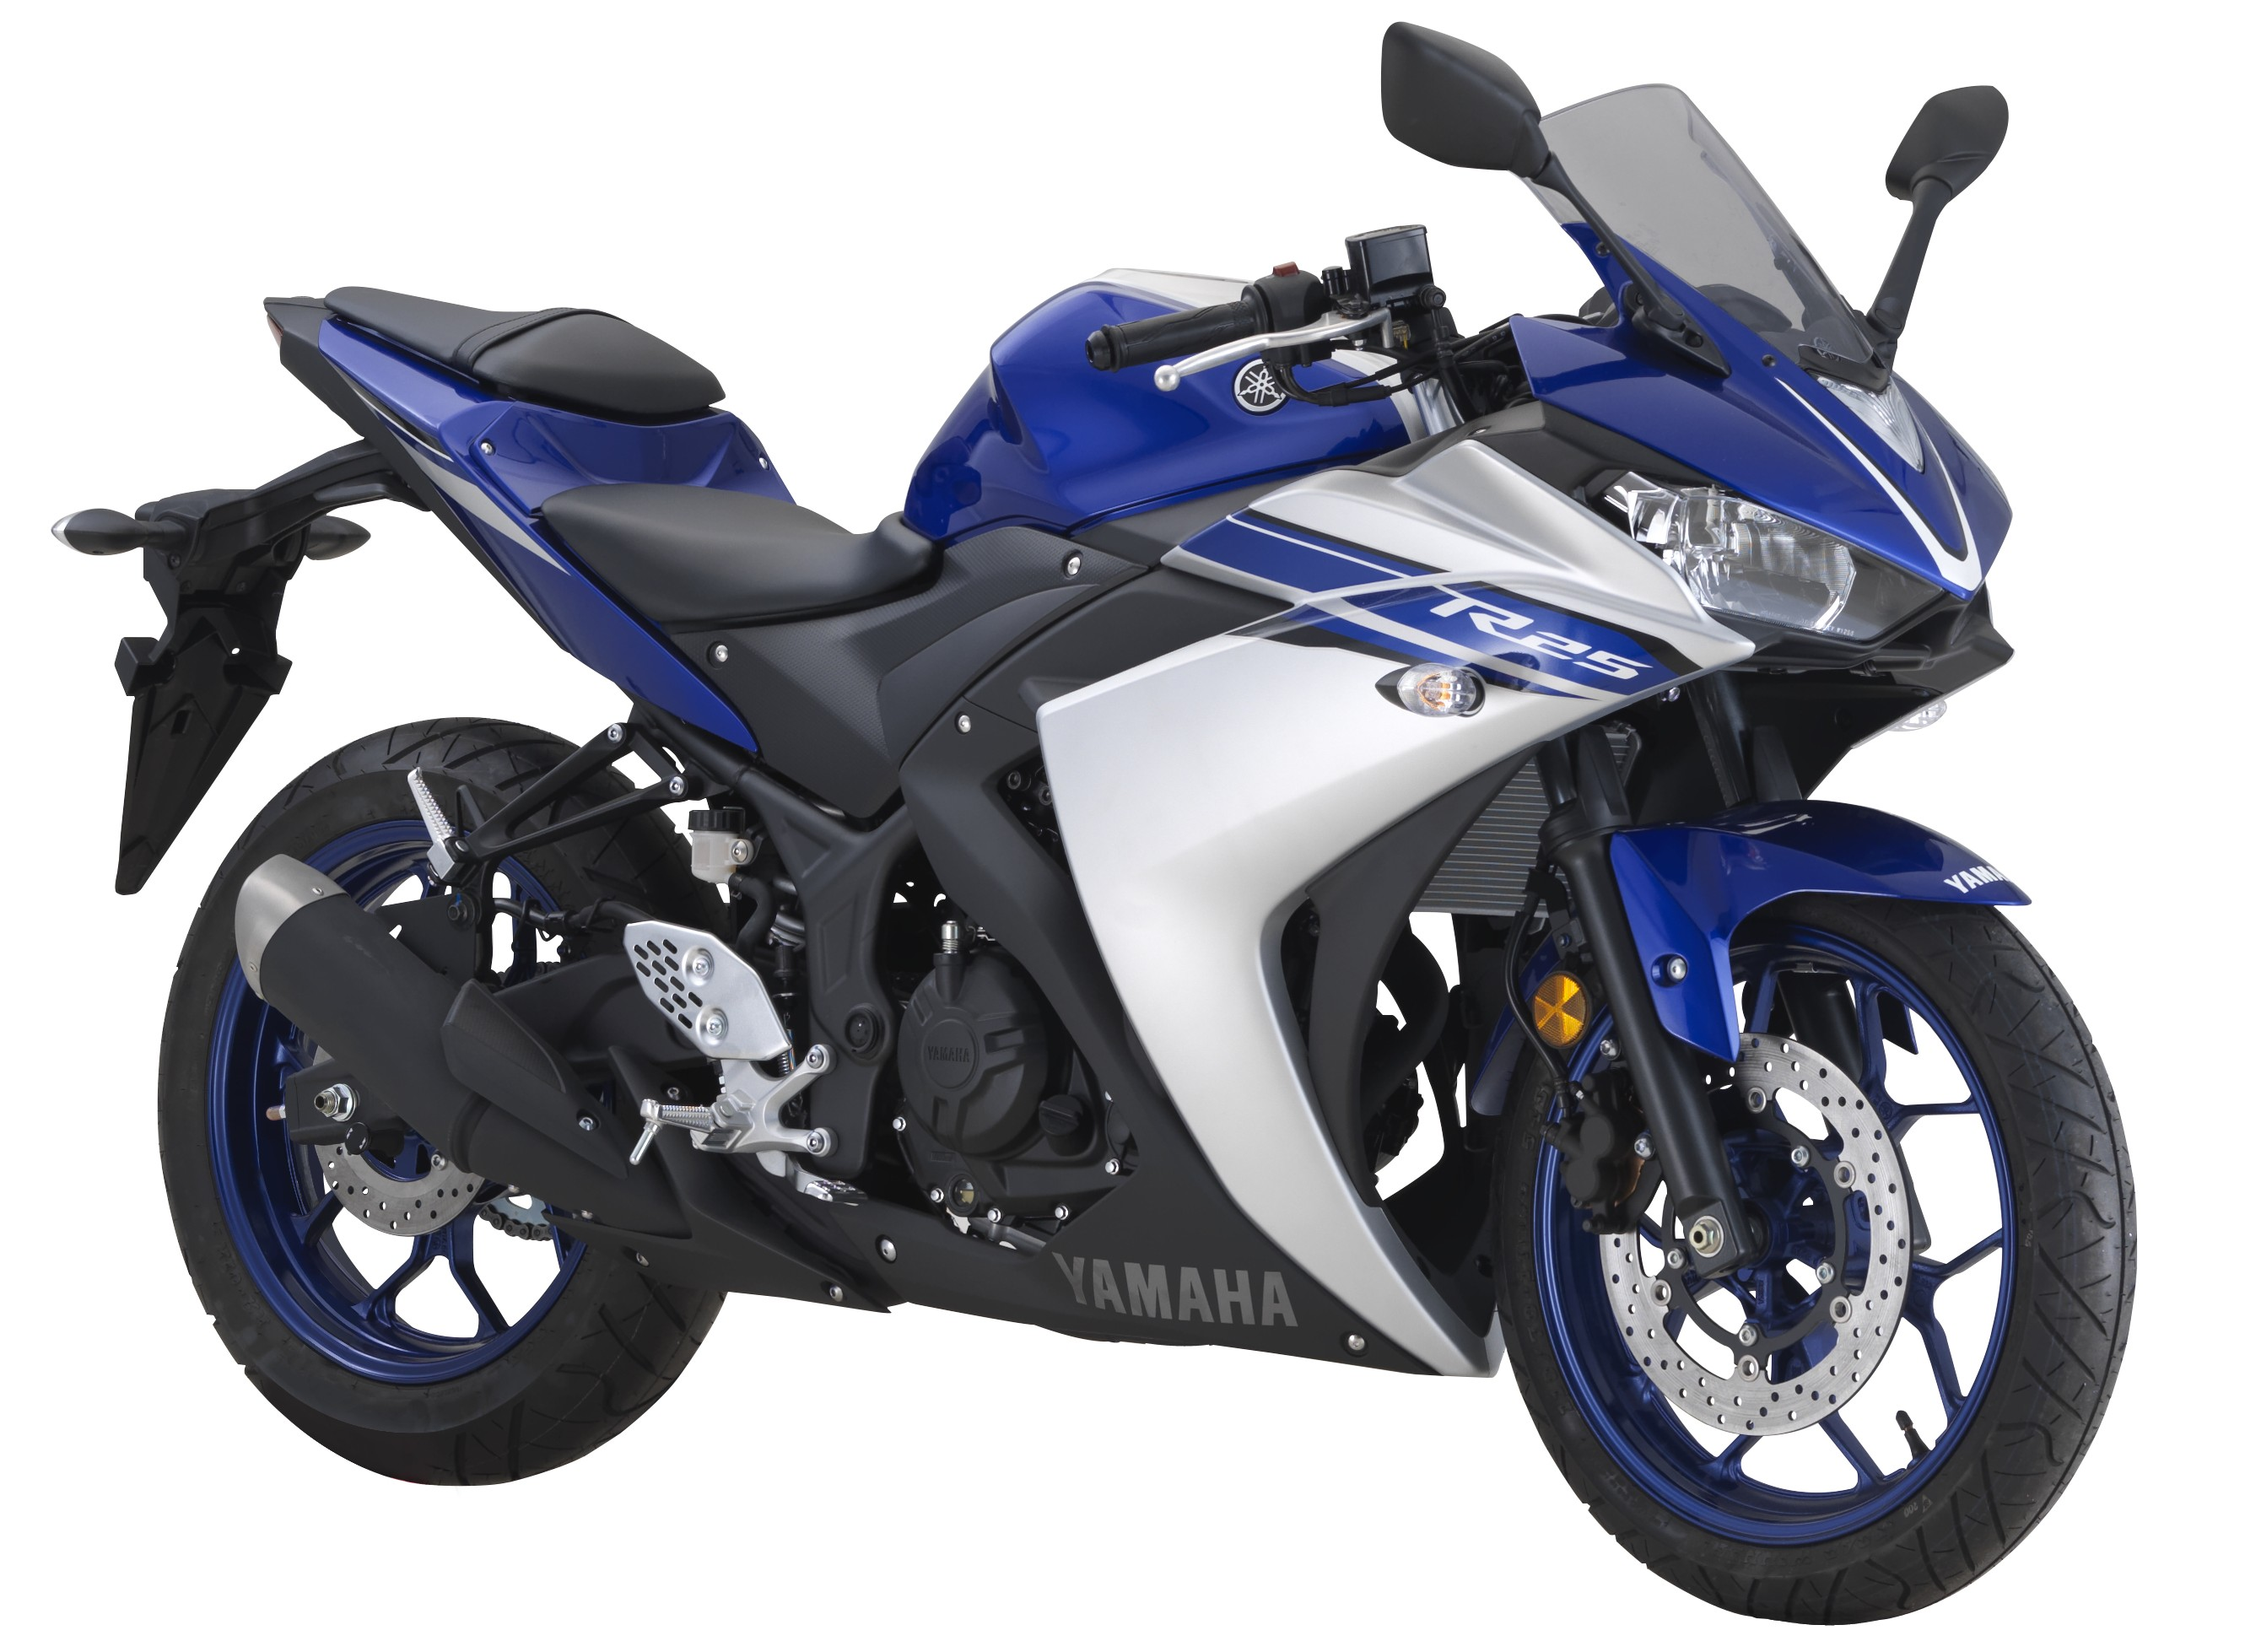 Yamaha Superbike Price